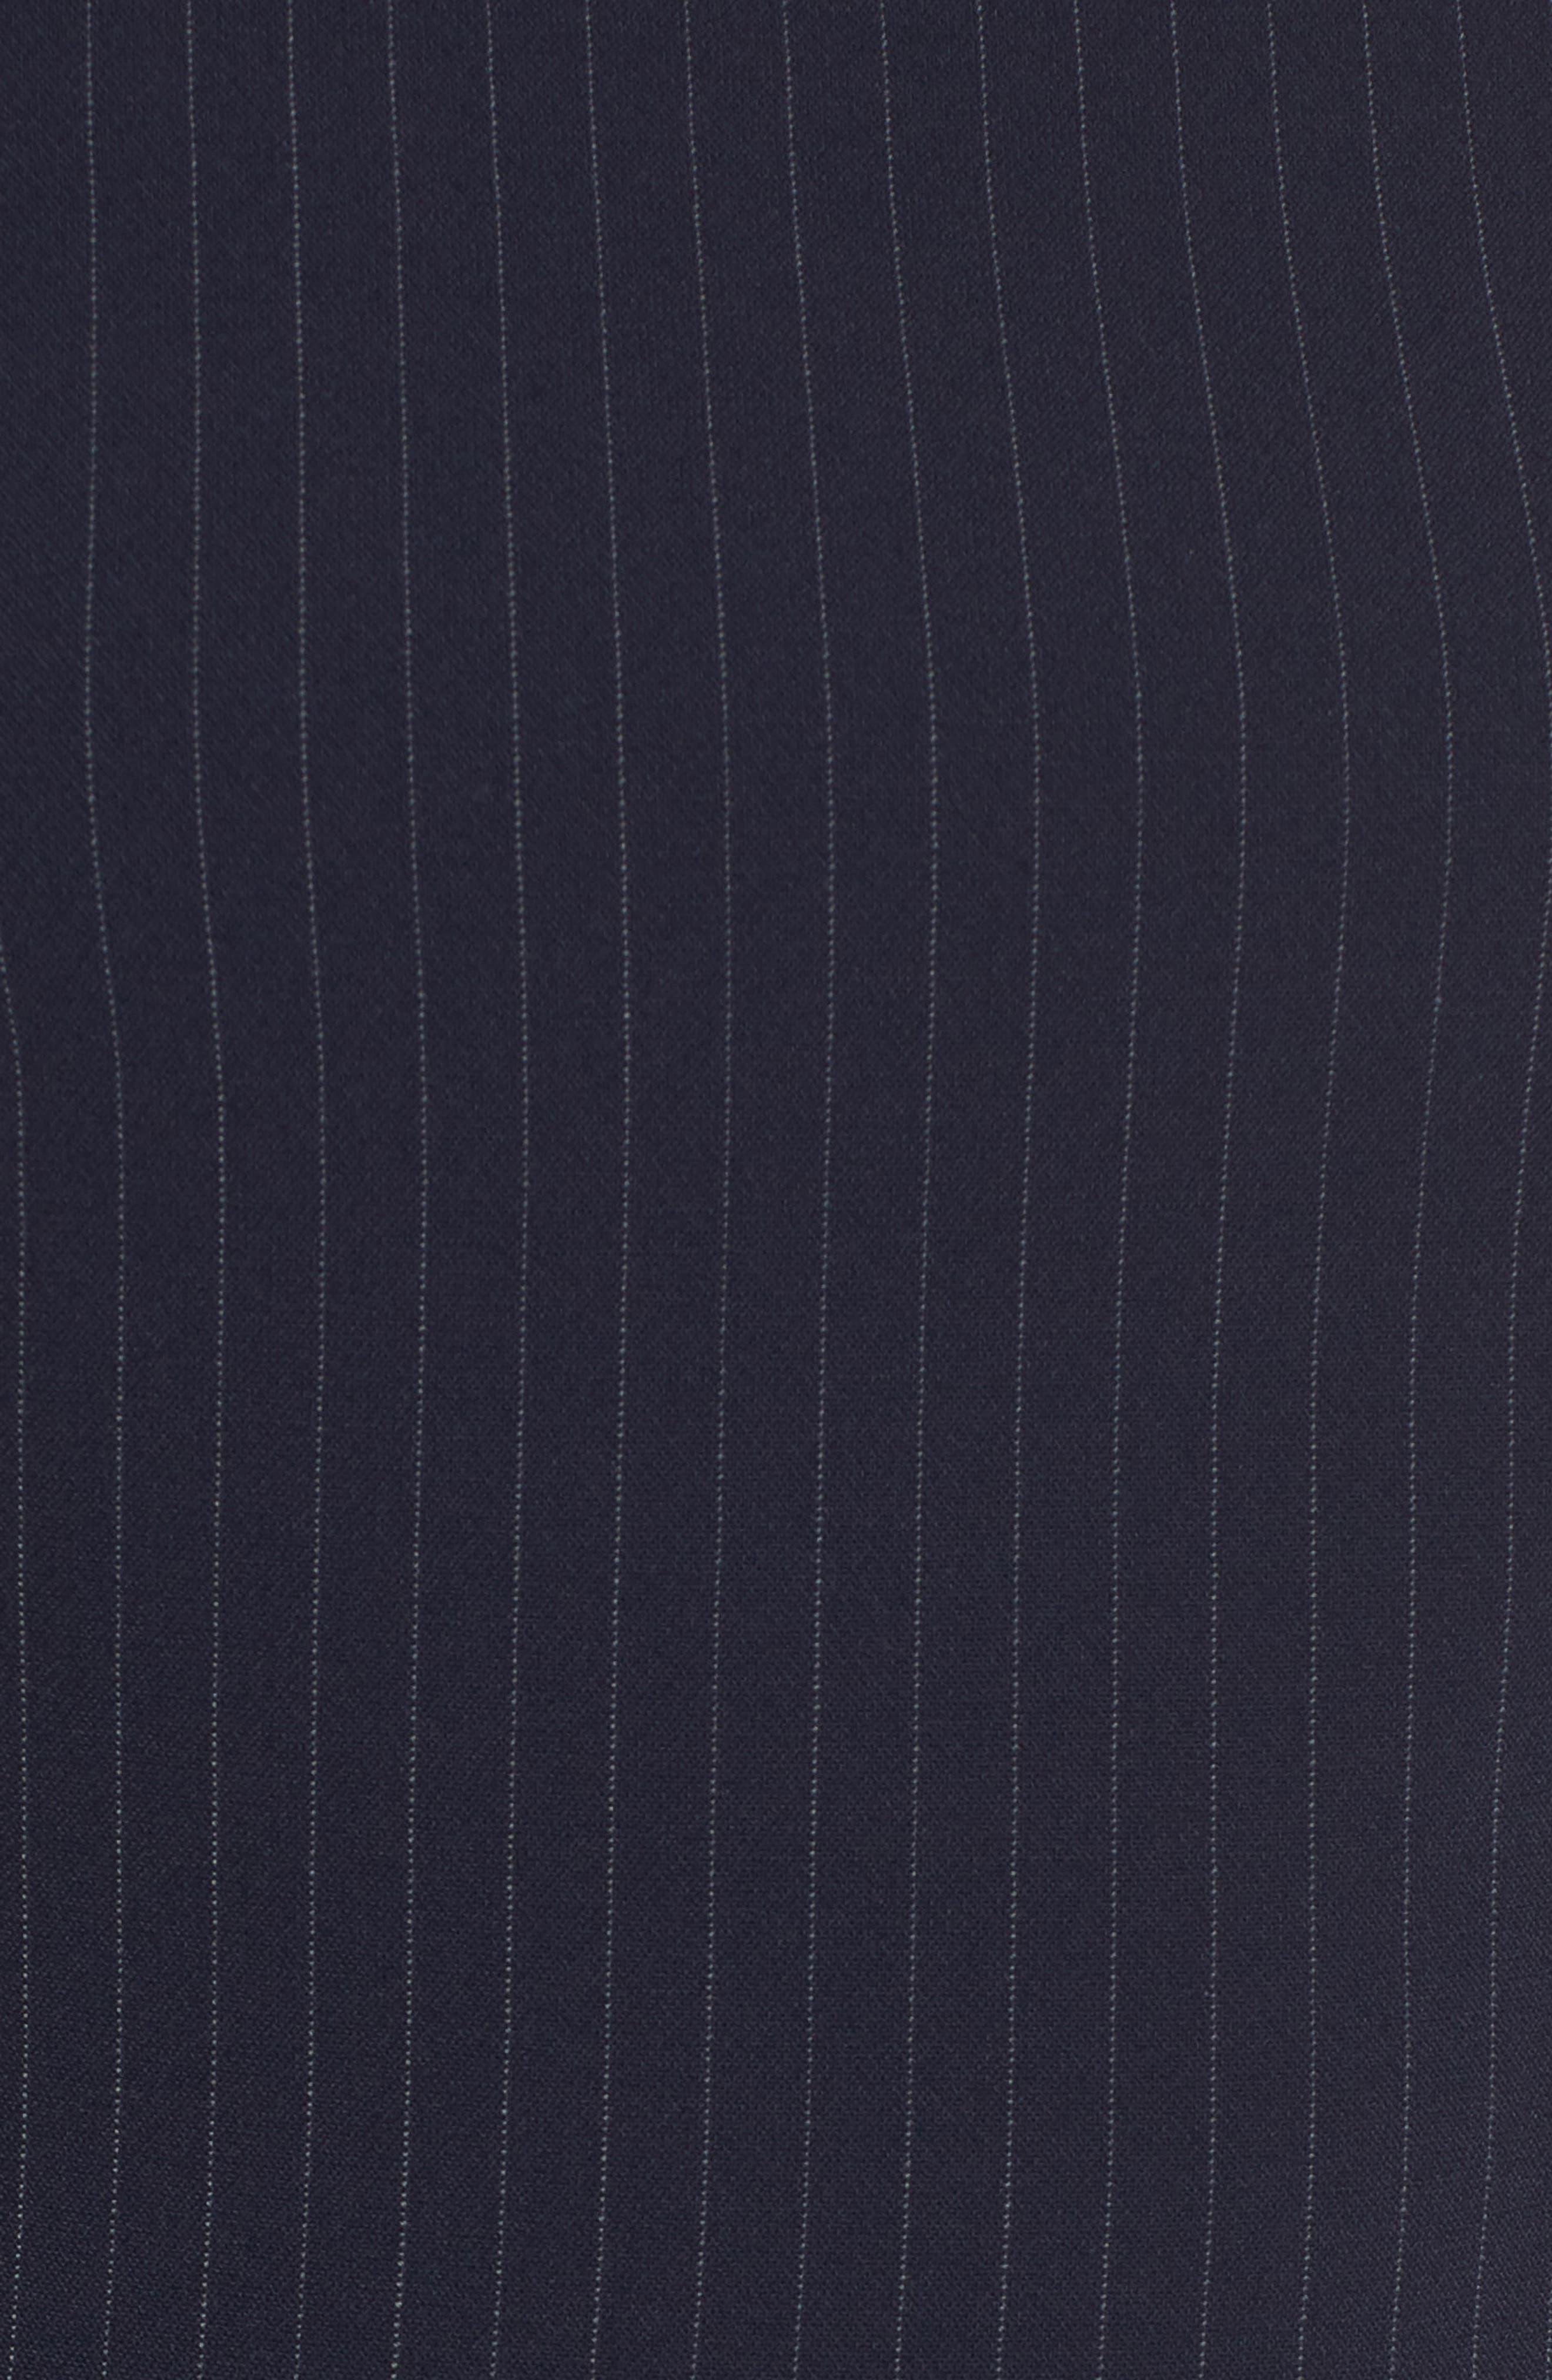 Denaka Pinstripe Sheath Dress,                             Alternate thumbnail 5, color,